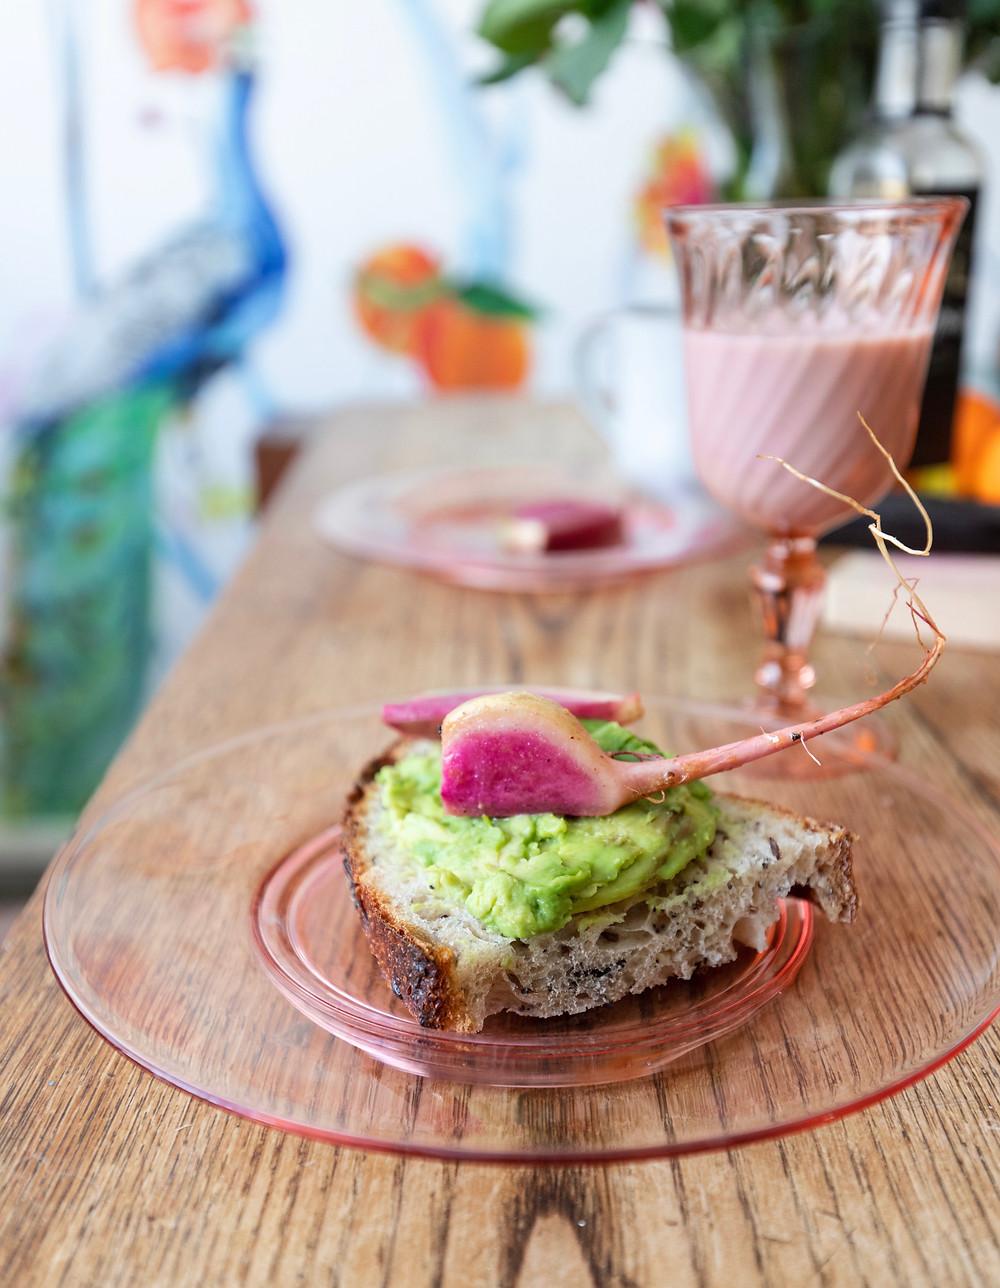 Avocado and sautéed radish sandwich detail